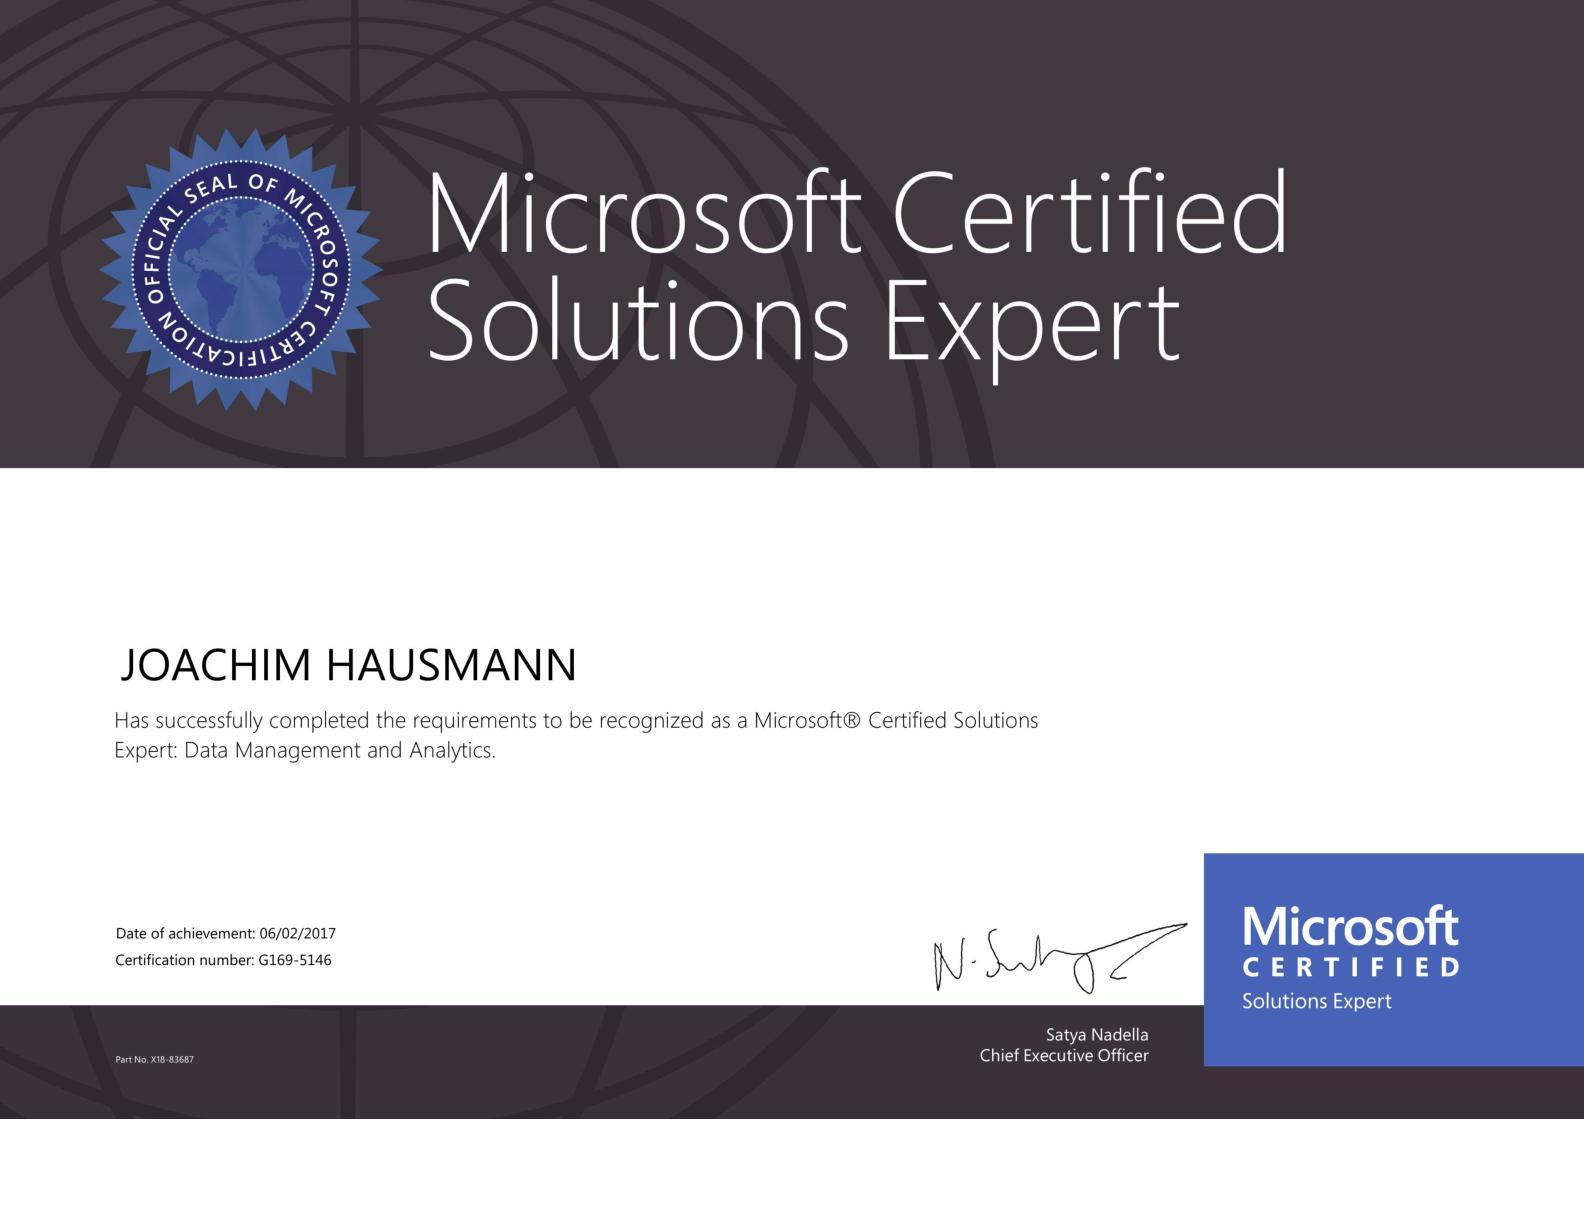 Amazing Microsoft Zertifikate Vorlagen Elaboration - FORTSETZUNG ...